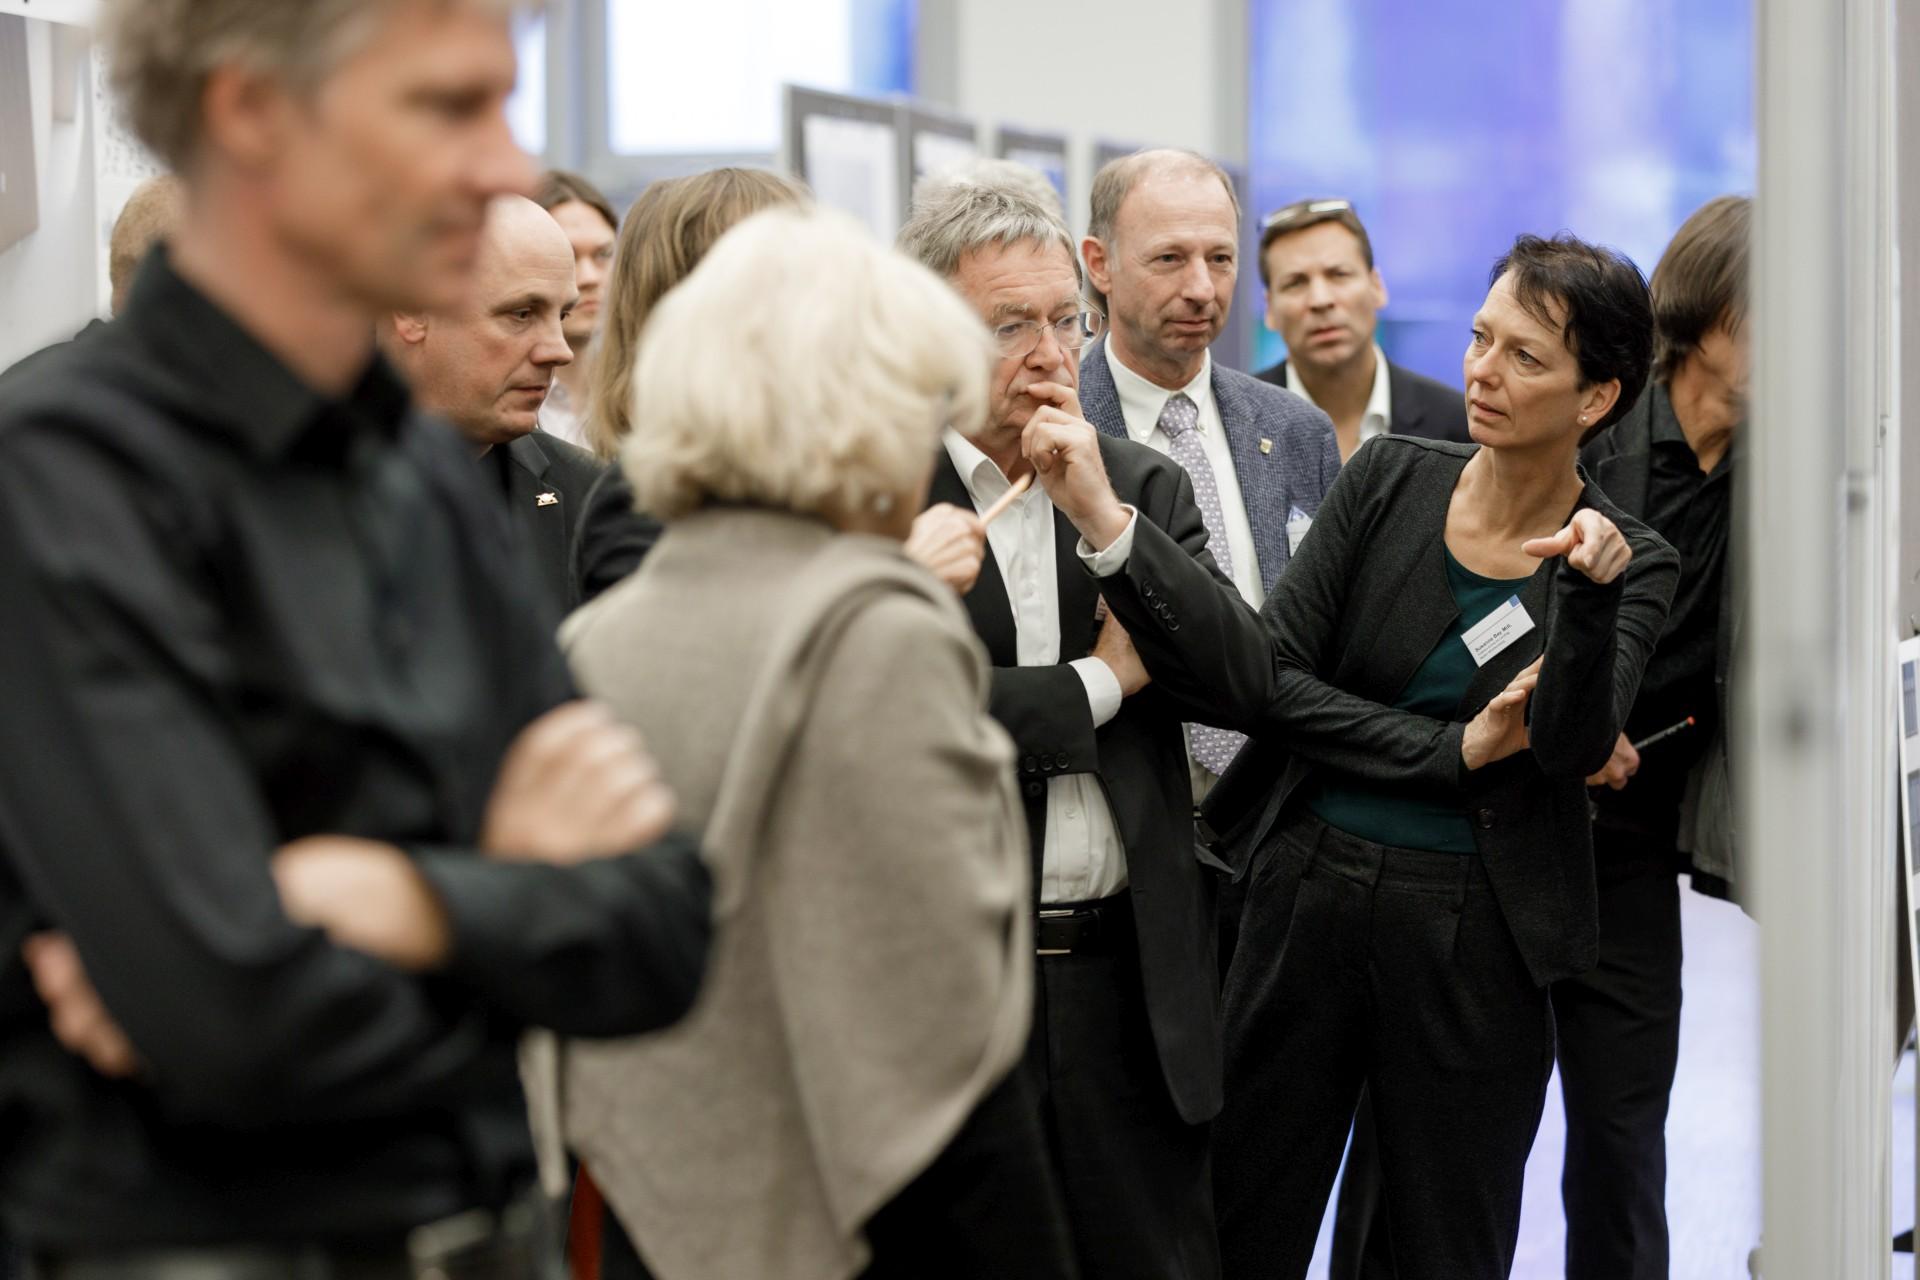 Jury des Staatspreis Baukultur Baden-Württemberg 2020 (Bild: Jan Potente)